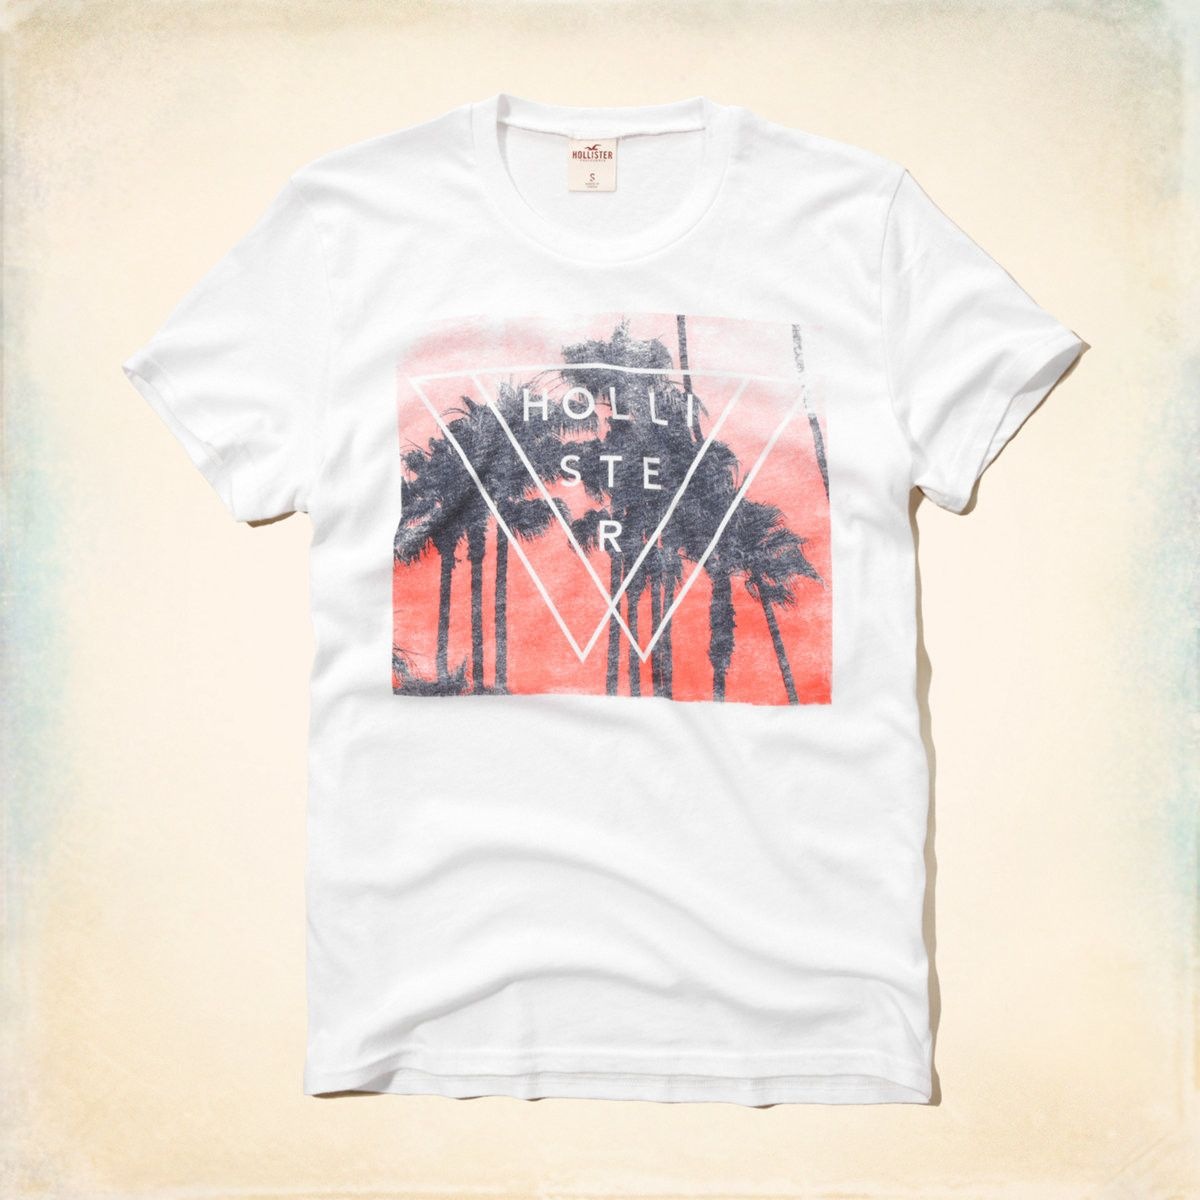 Black t shirts hollister - Hollister Mens Vintage Logo Graphic T Shirt White Fashionfest